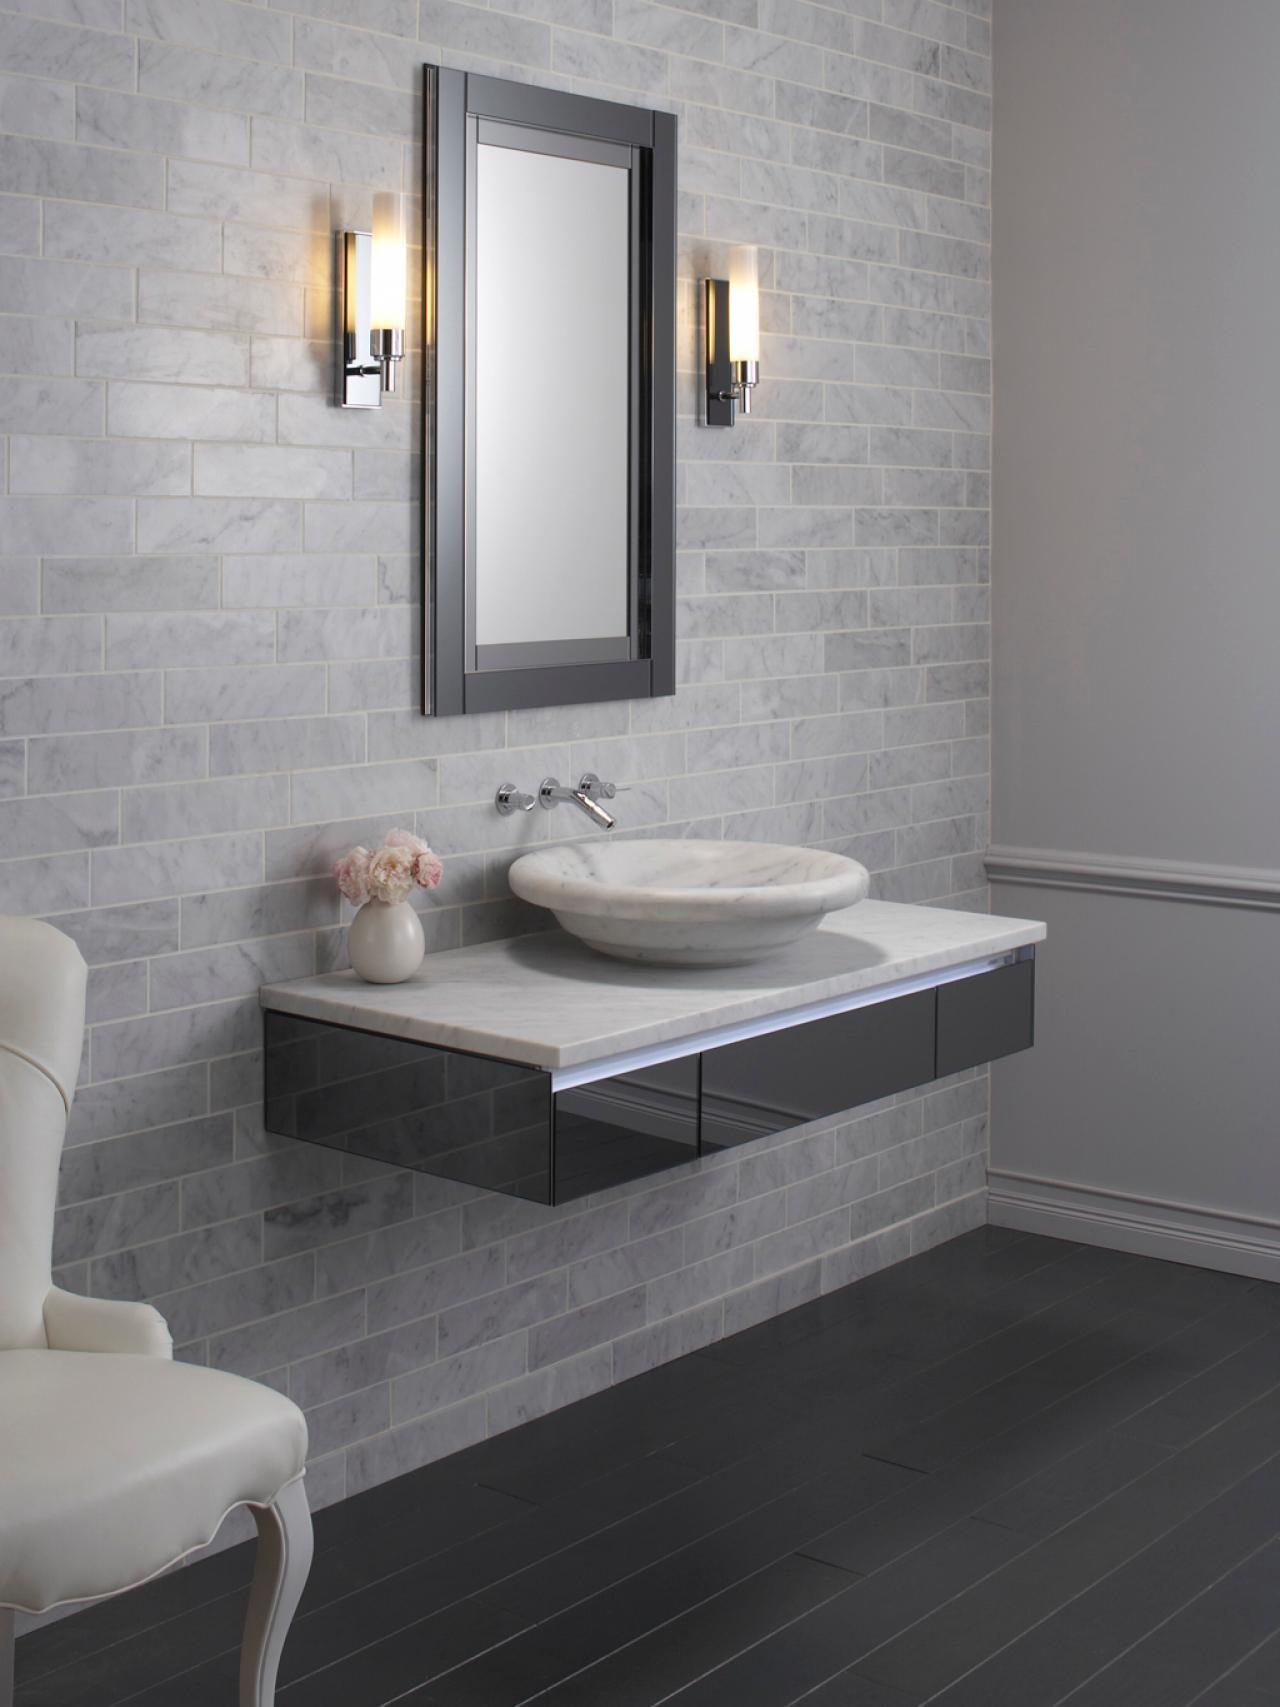 Design a Bath That Grows With You & Design a Bath That Grows With You | Bath remodel Bathroom designs ... azcodes.com